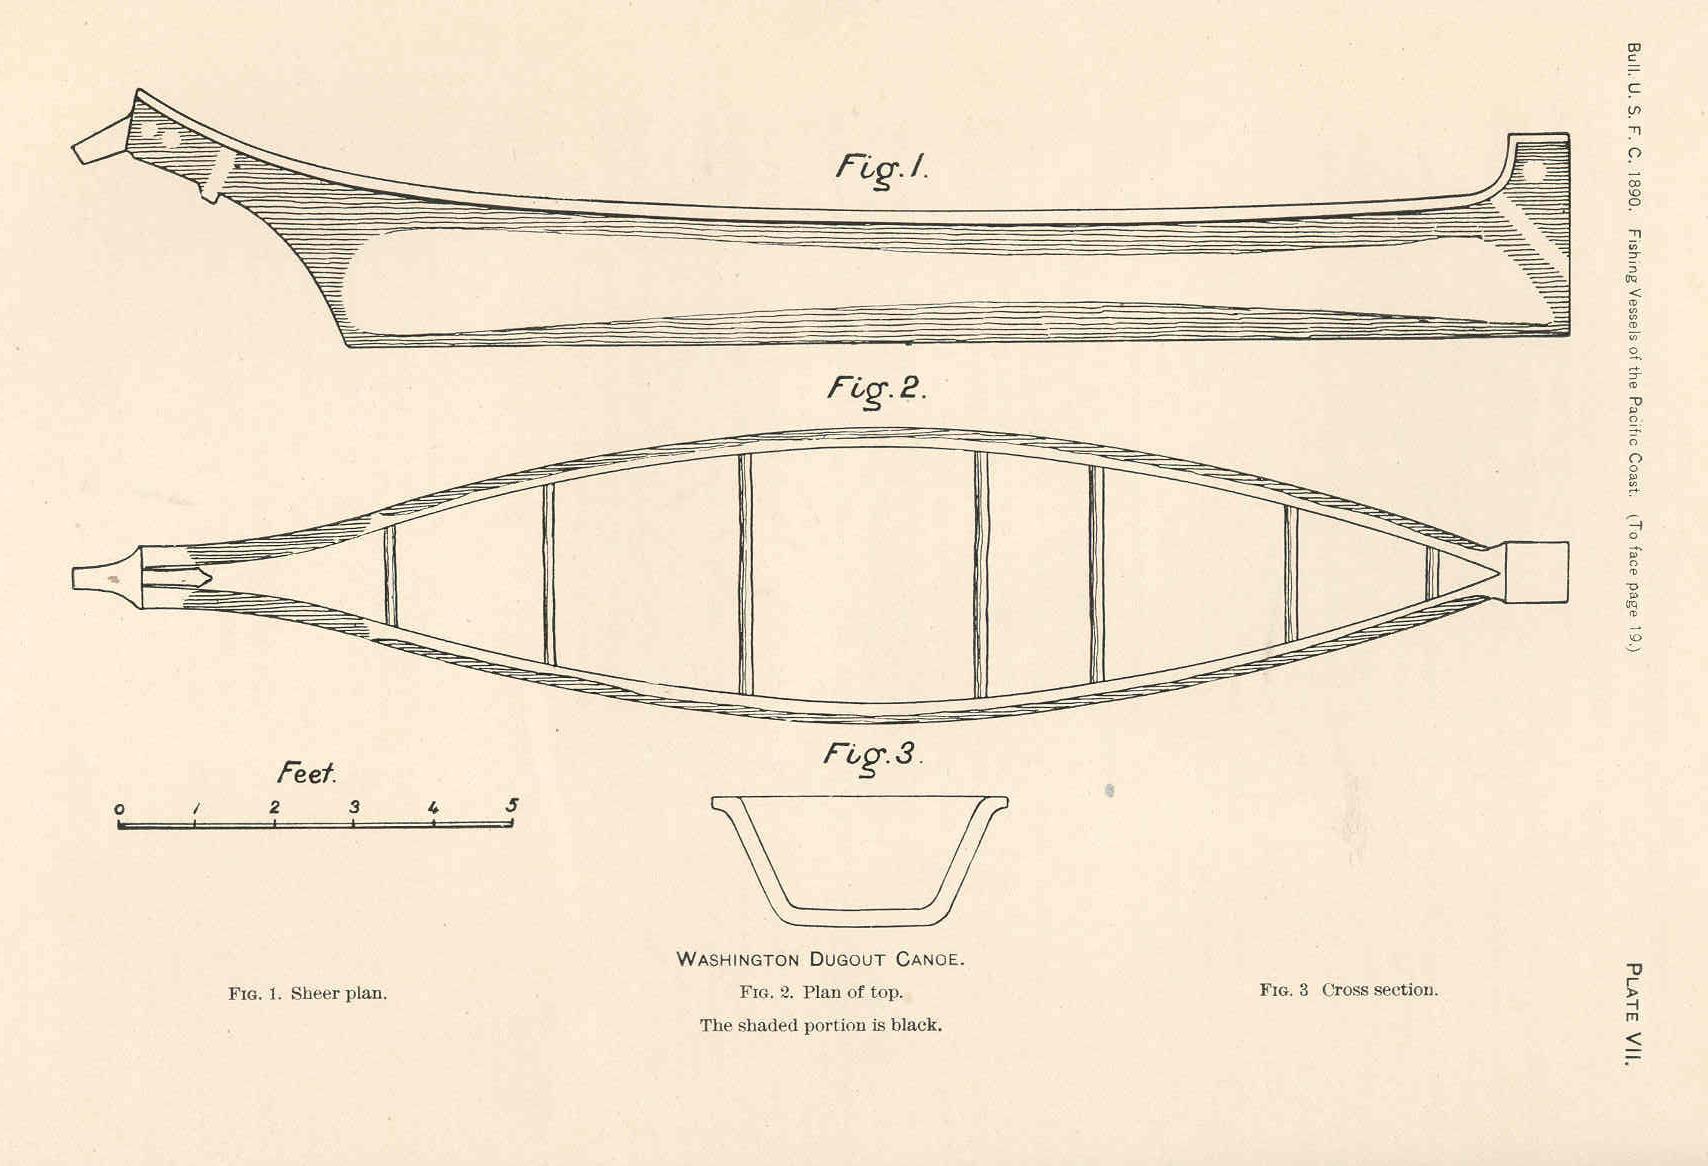 hight resolution of file fmib 37916 washington dugout canoe jpeg wikimedia commons dugout canoe diagram dugout canoe diagram